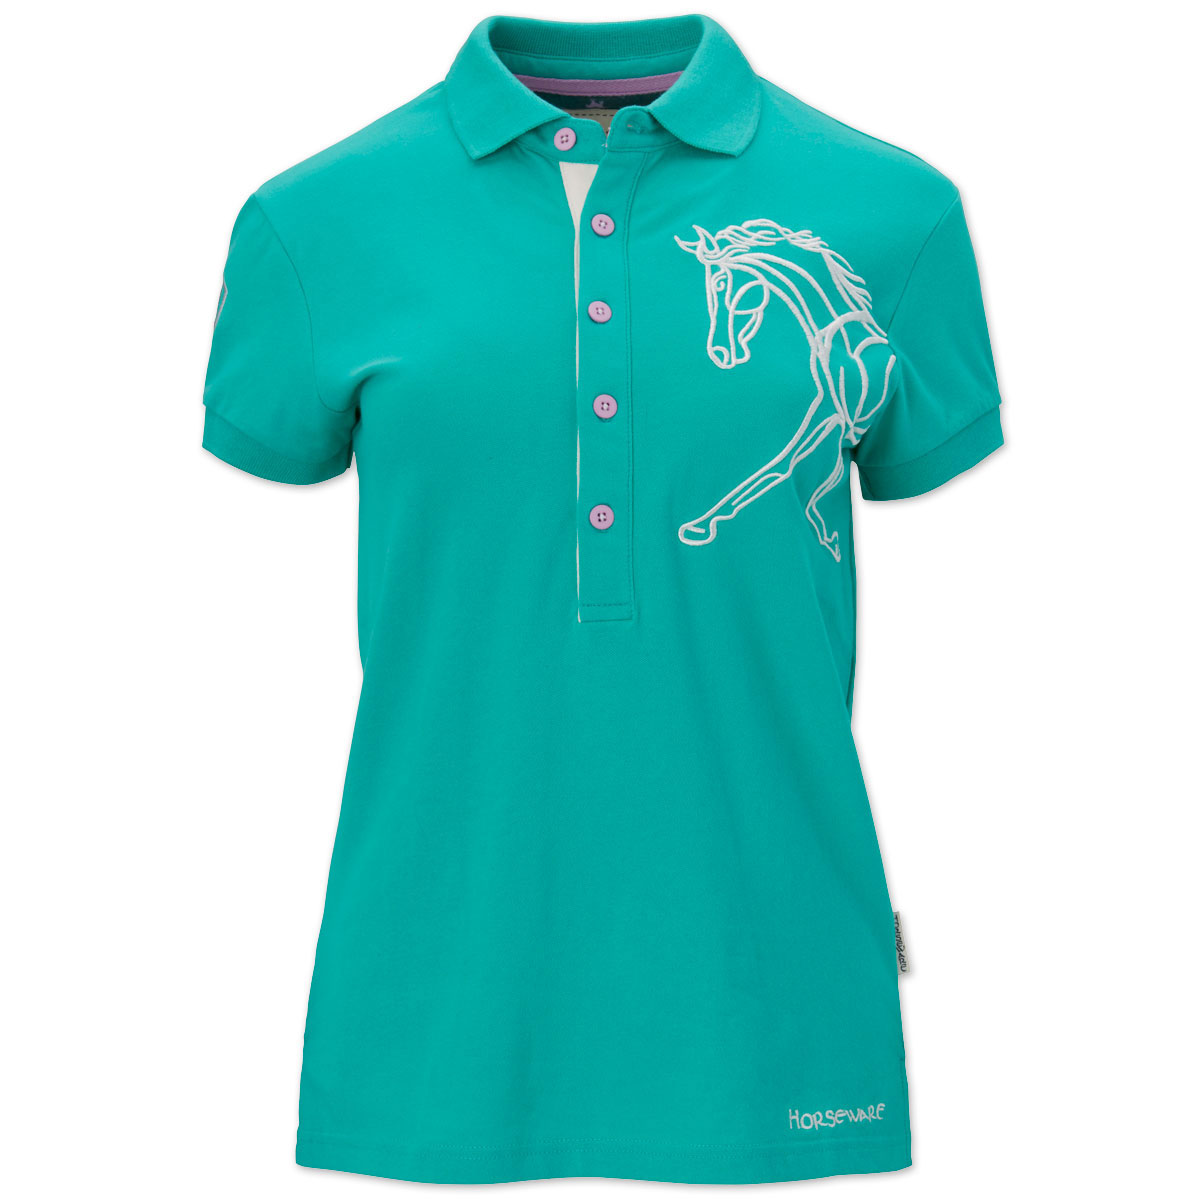 Horseware Flamboro Polo Shirt - Sale!